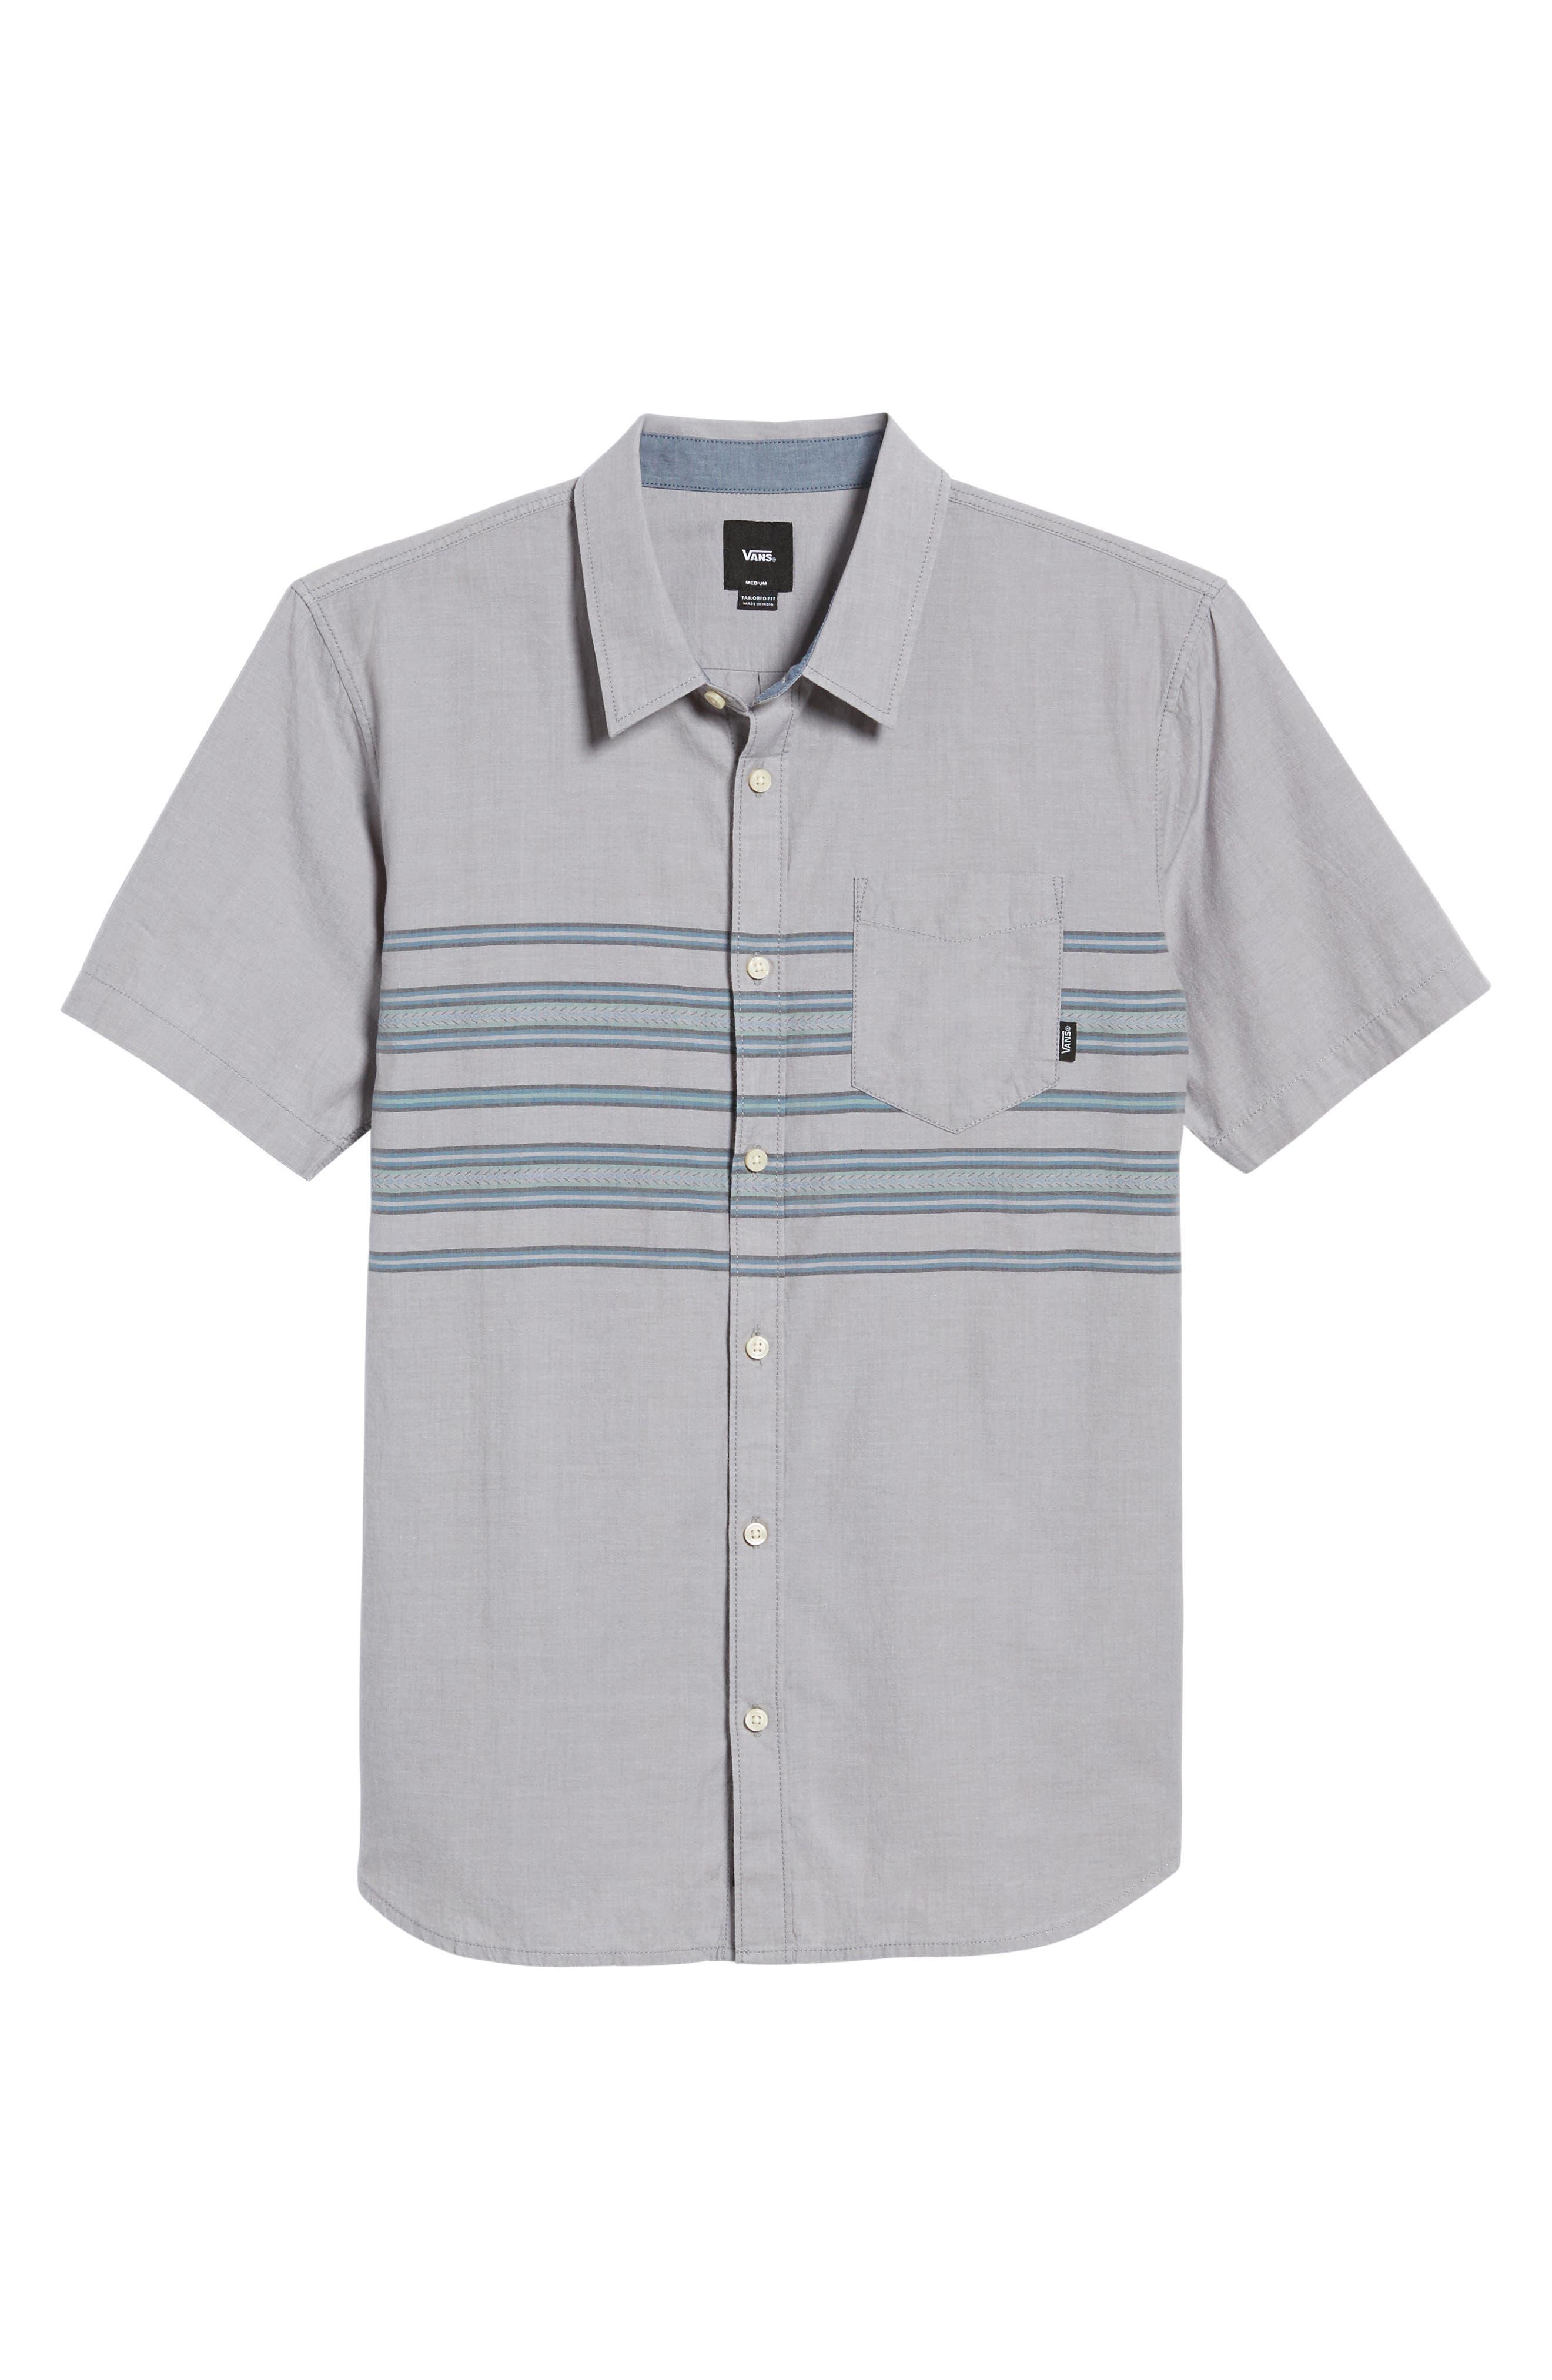 Benmore Striped Woven Shirt,                             Alternate thumbnail 6, color,                             021